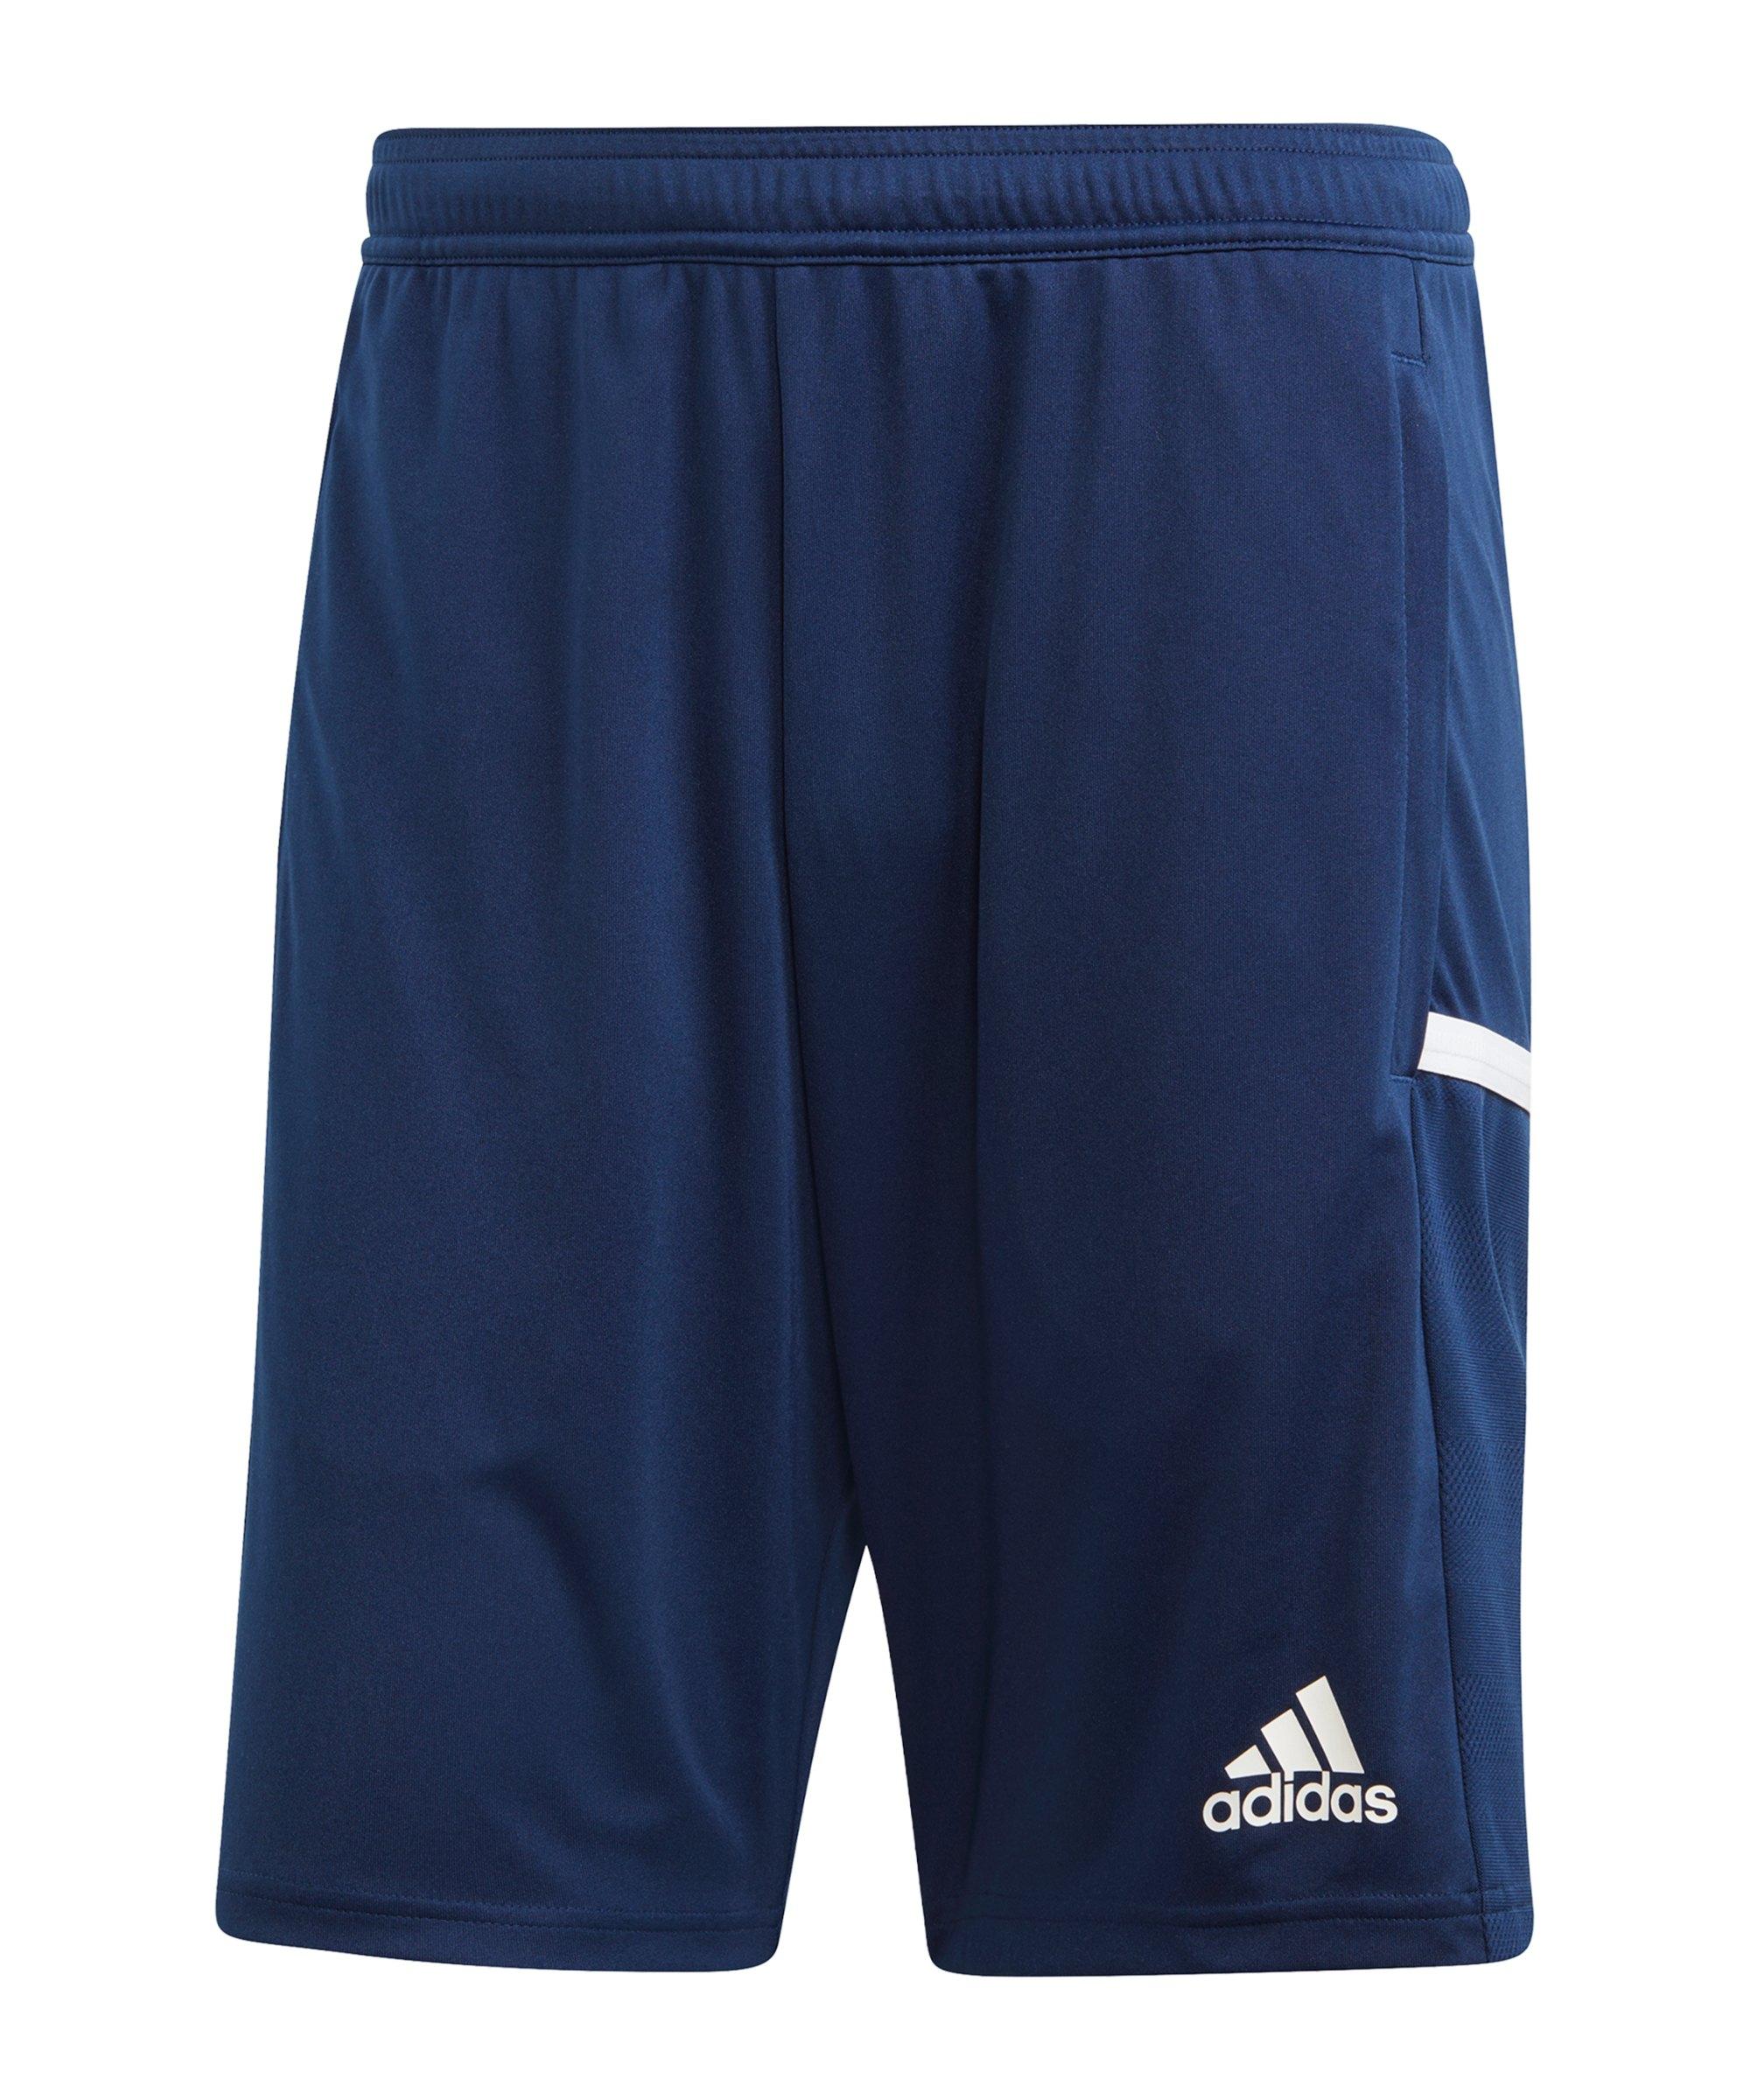 adidas Team 19 3-Pocket Short Blau - blau